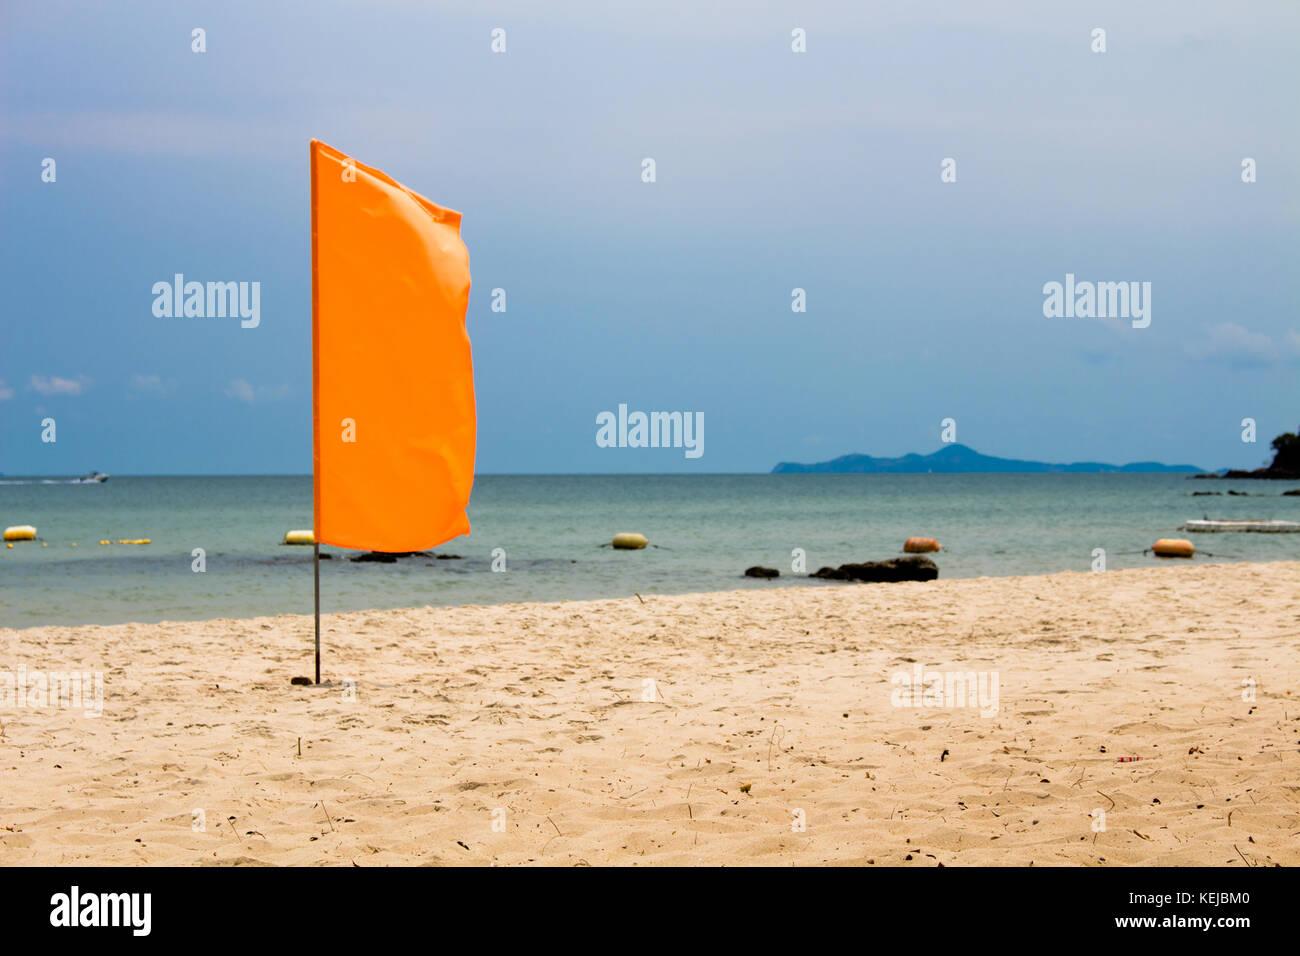 The orange flag on beach, sea background Stock Photo